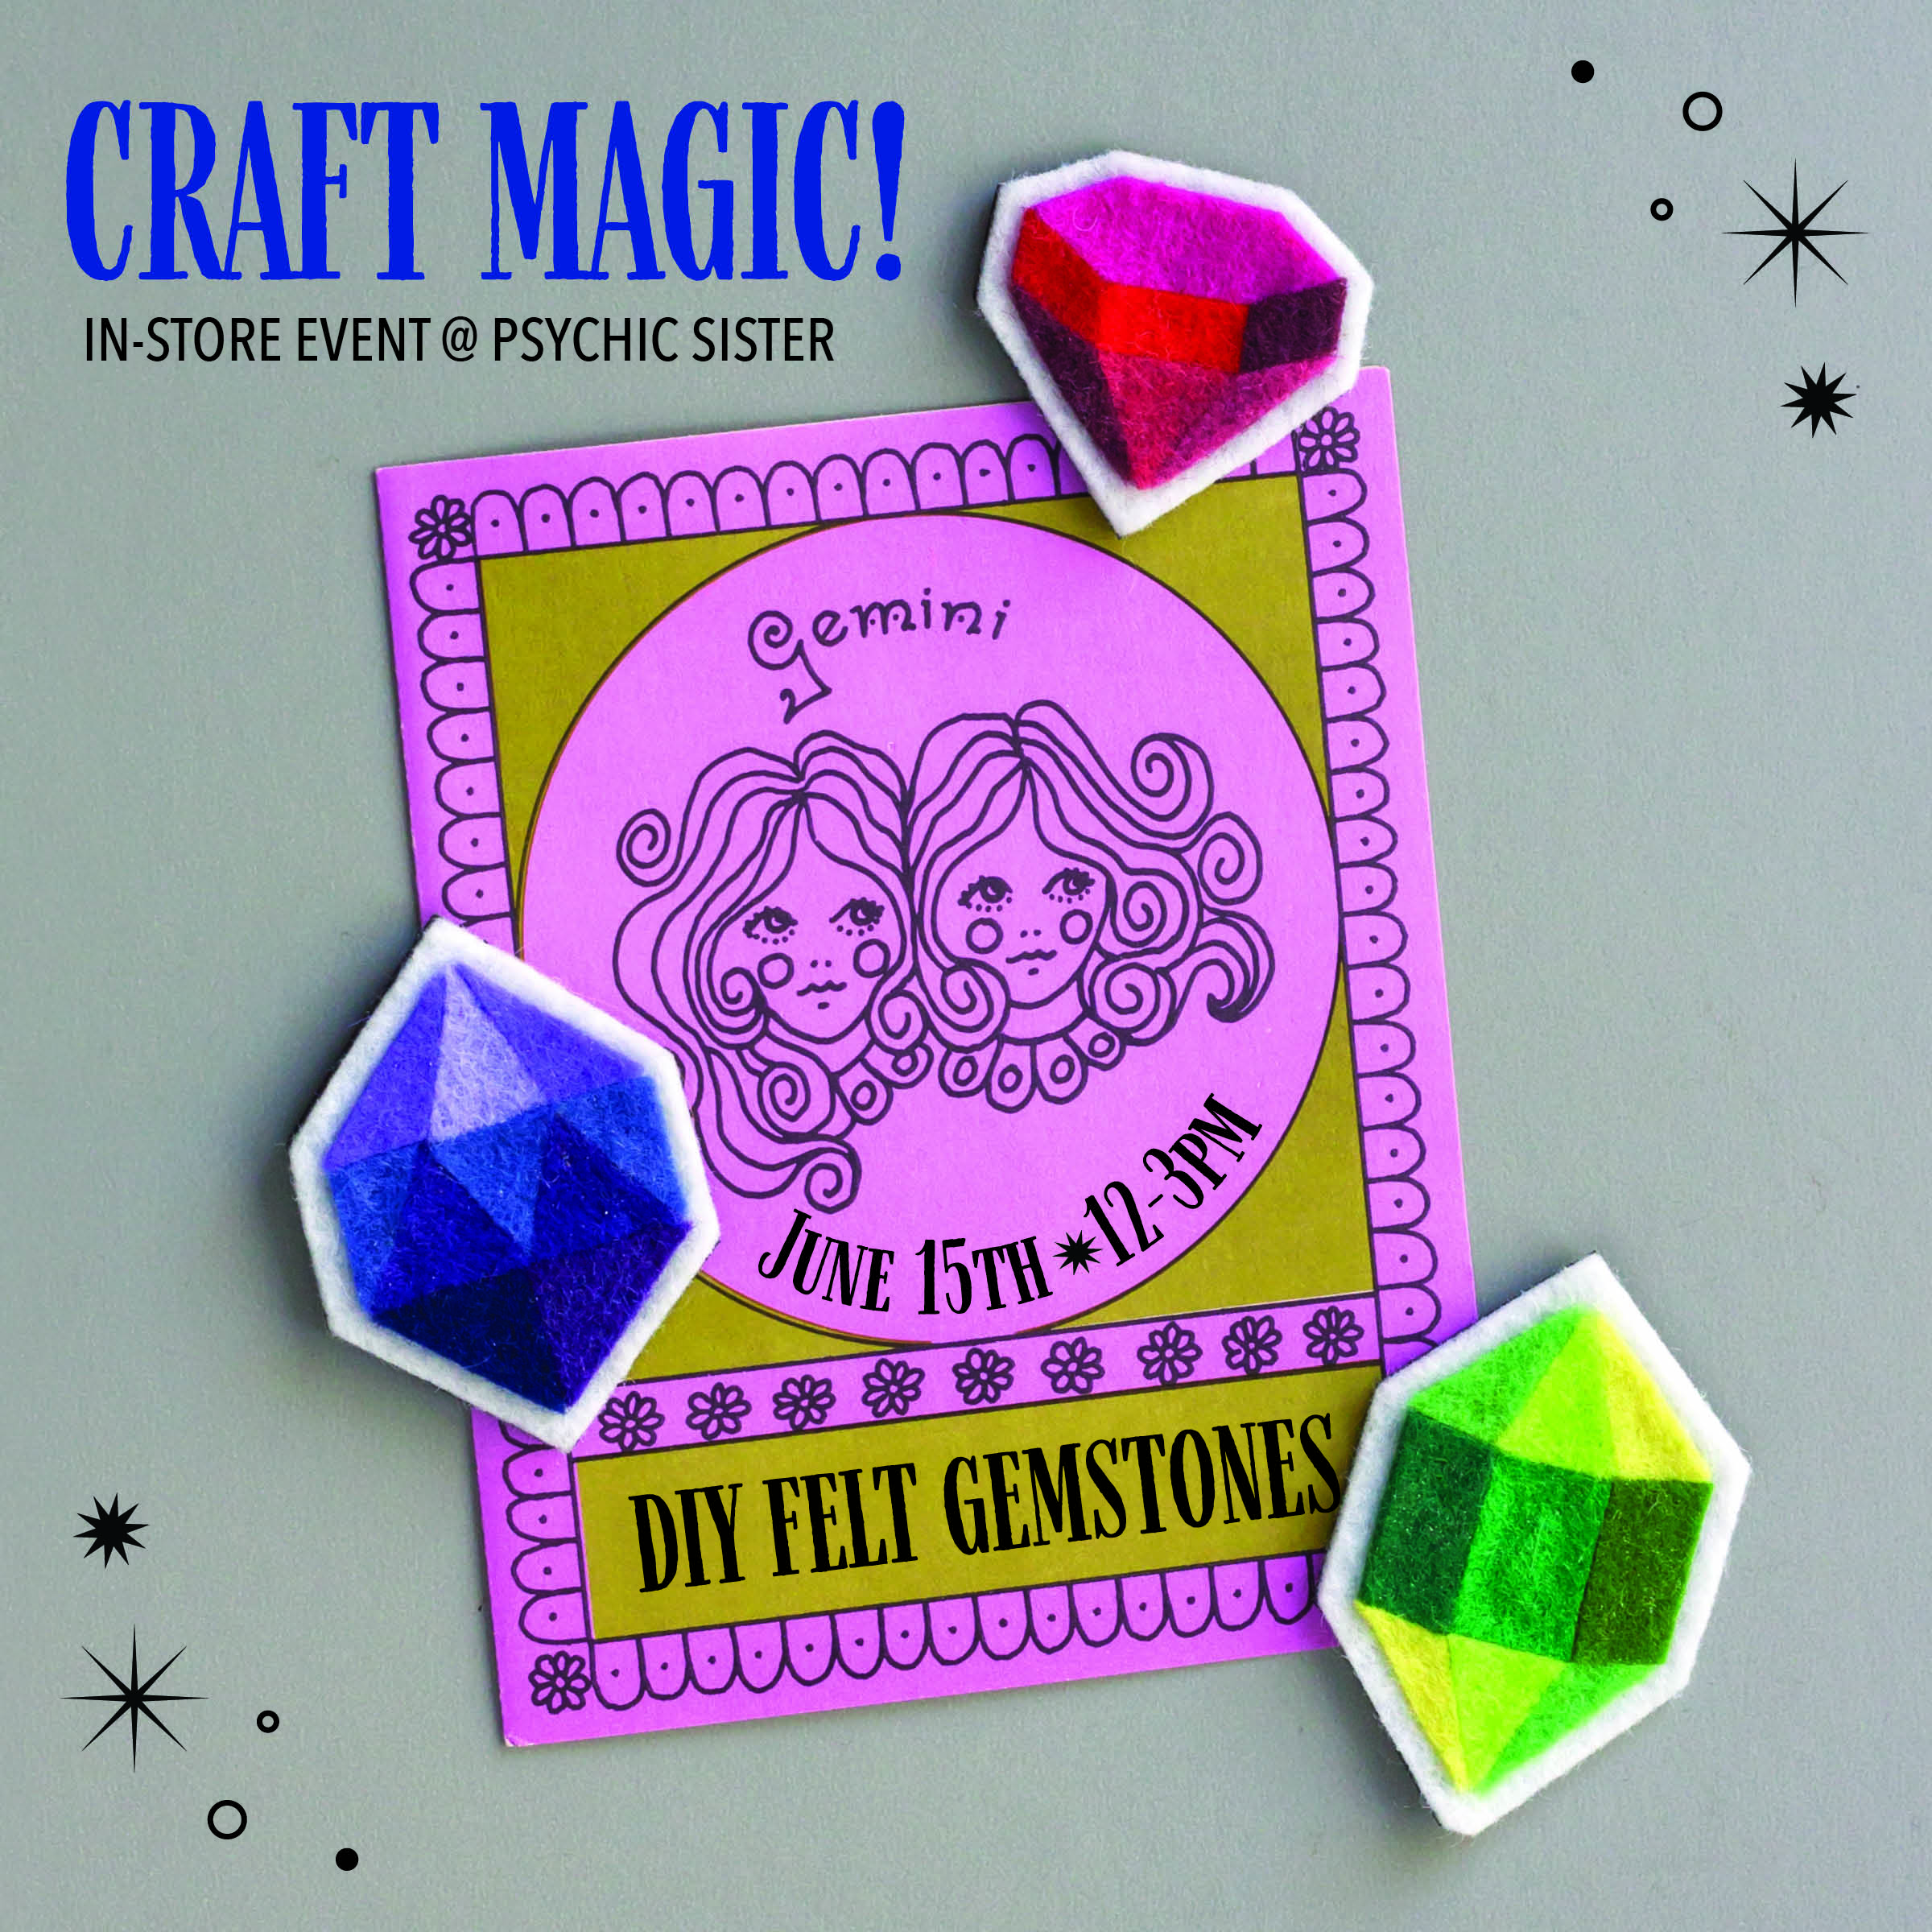 diy-felt-gemstone-image-2.jpg